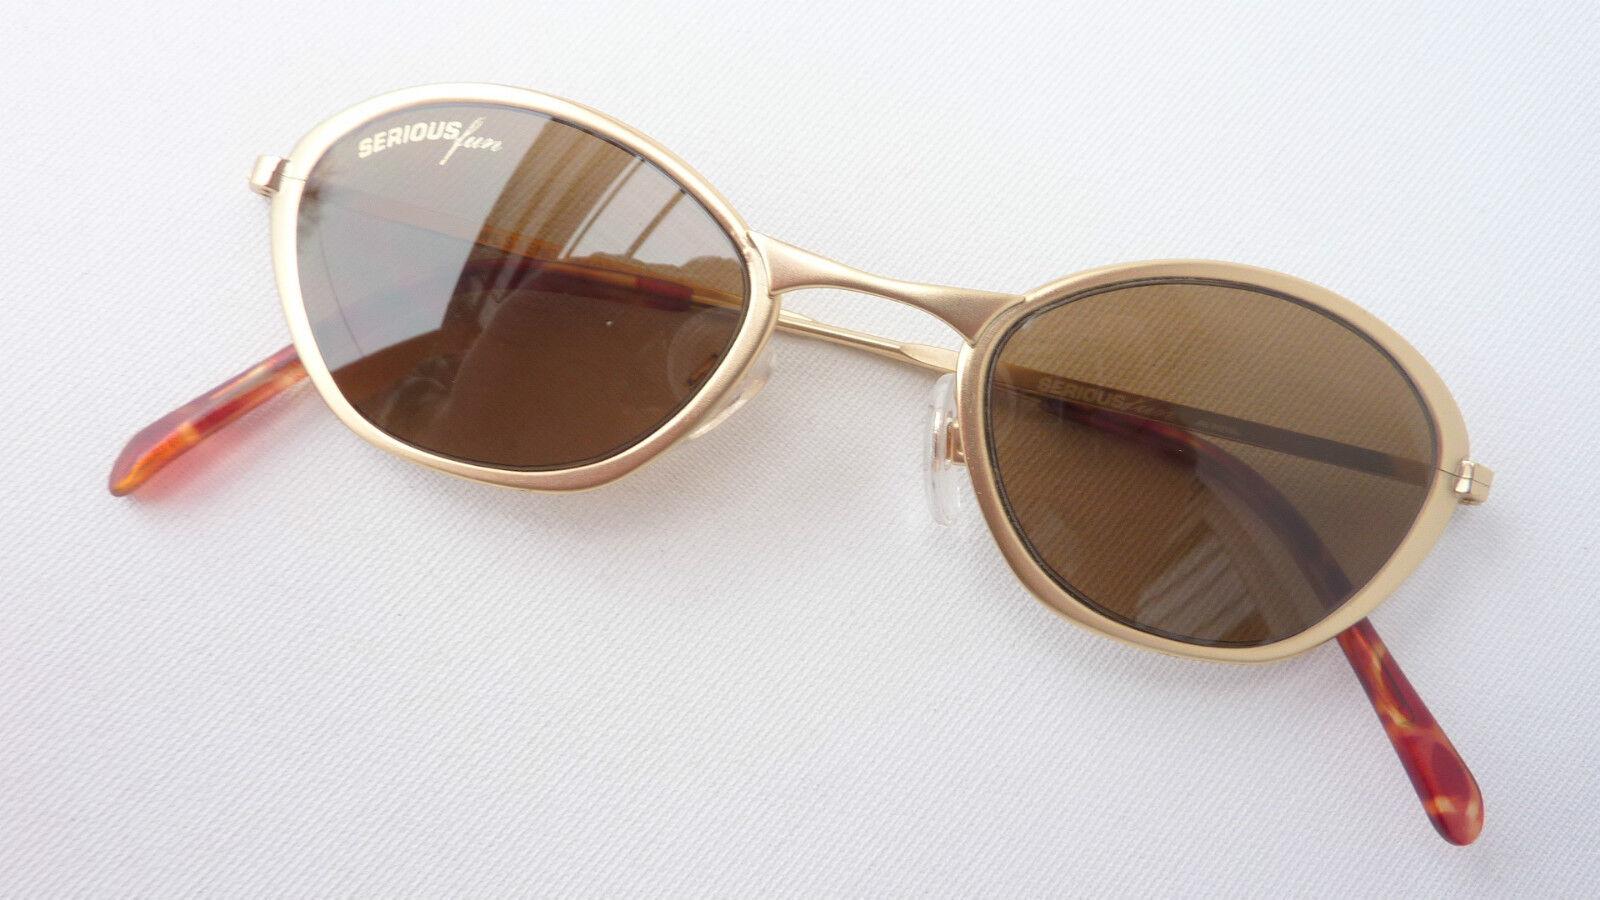 Serious Fun Damen Damen Damen Sonnenbrille Metall Goldmatt Butterfly braune Tönung Grösse M       Niedriger Preis und gute Qualität    Wirtschaft    Bequeme Berührung  5cdcc8